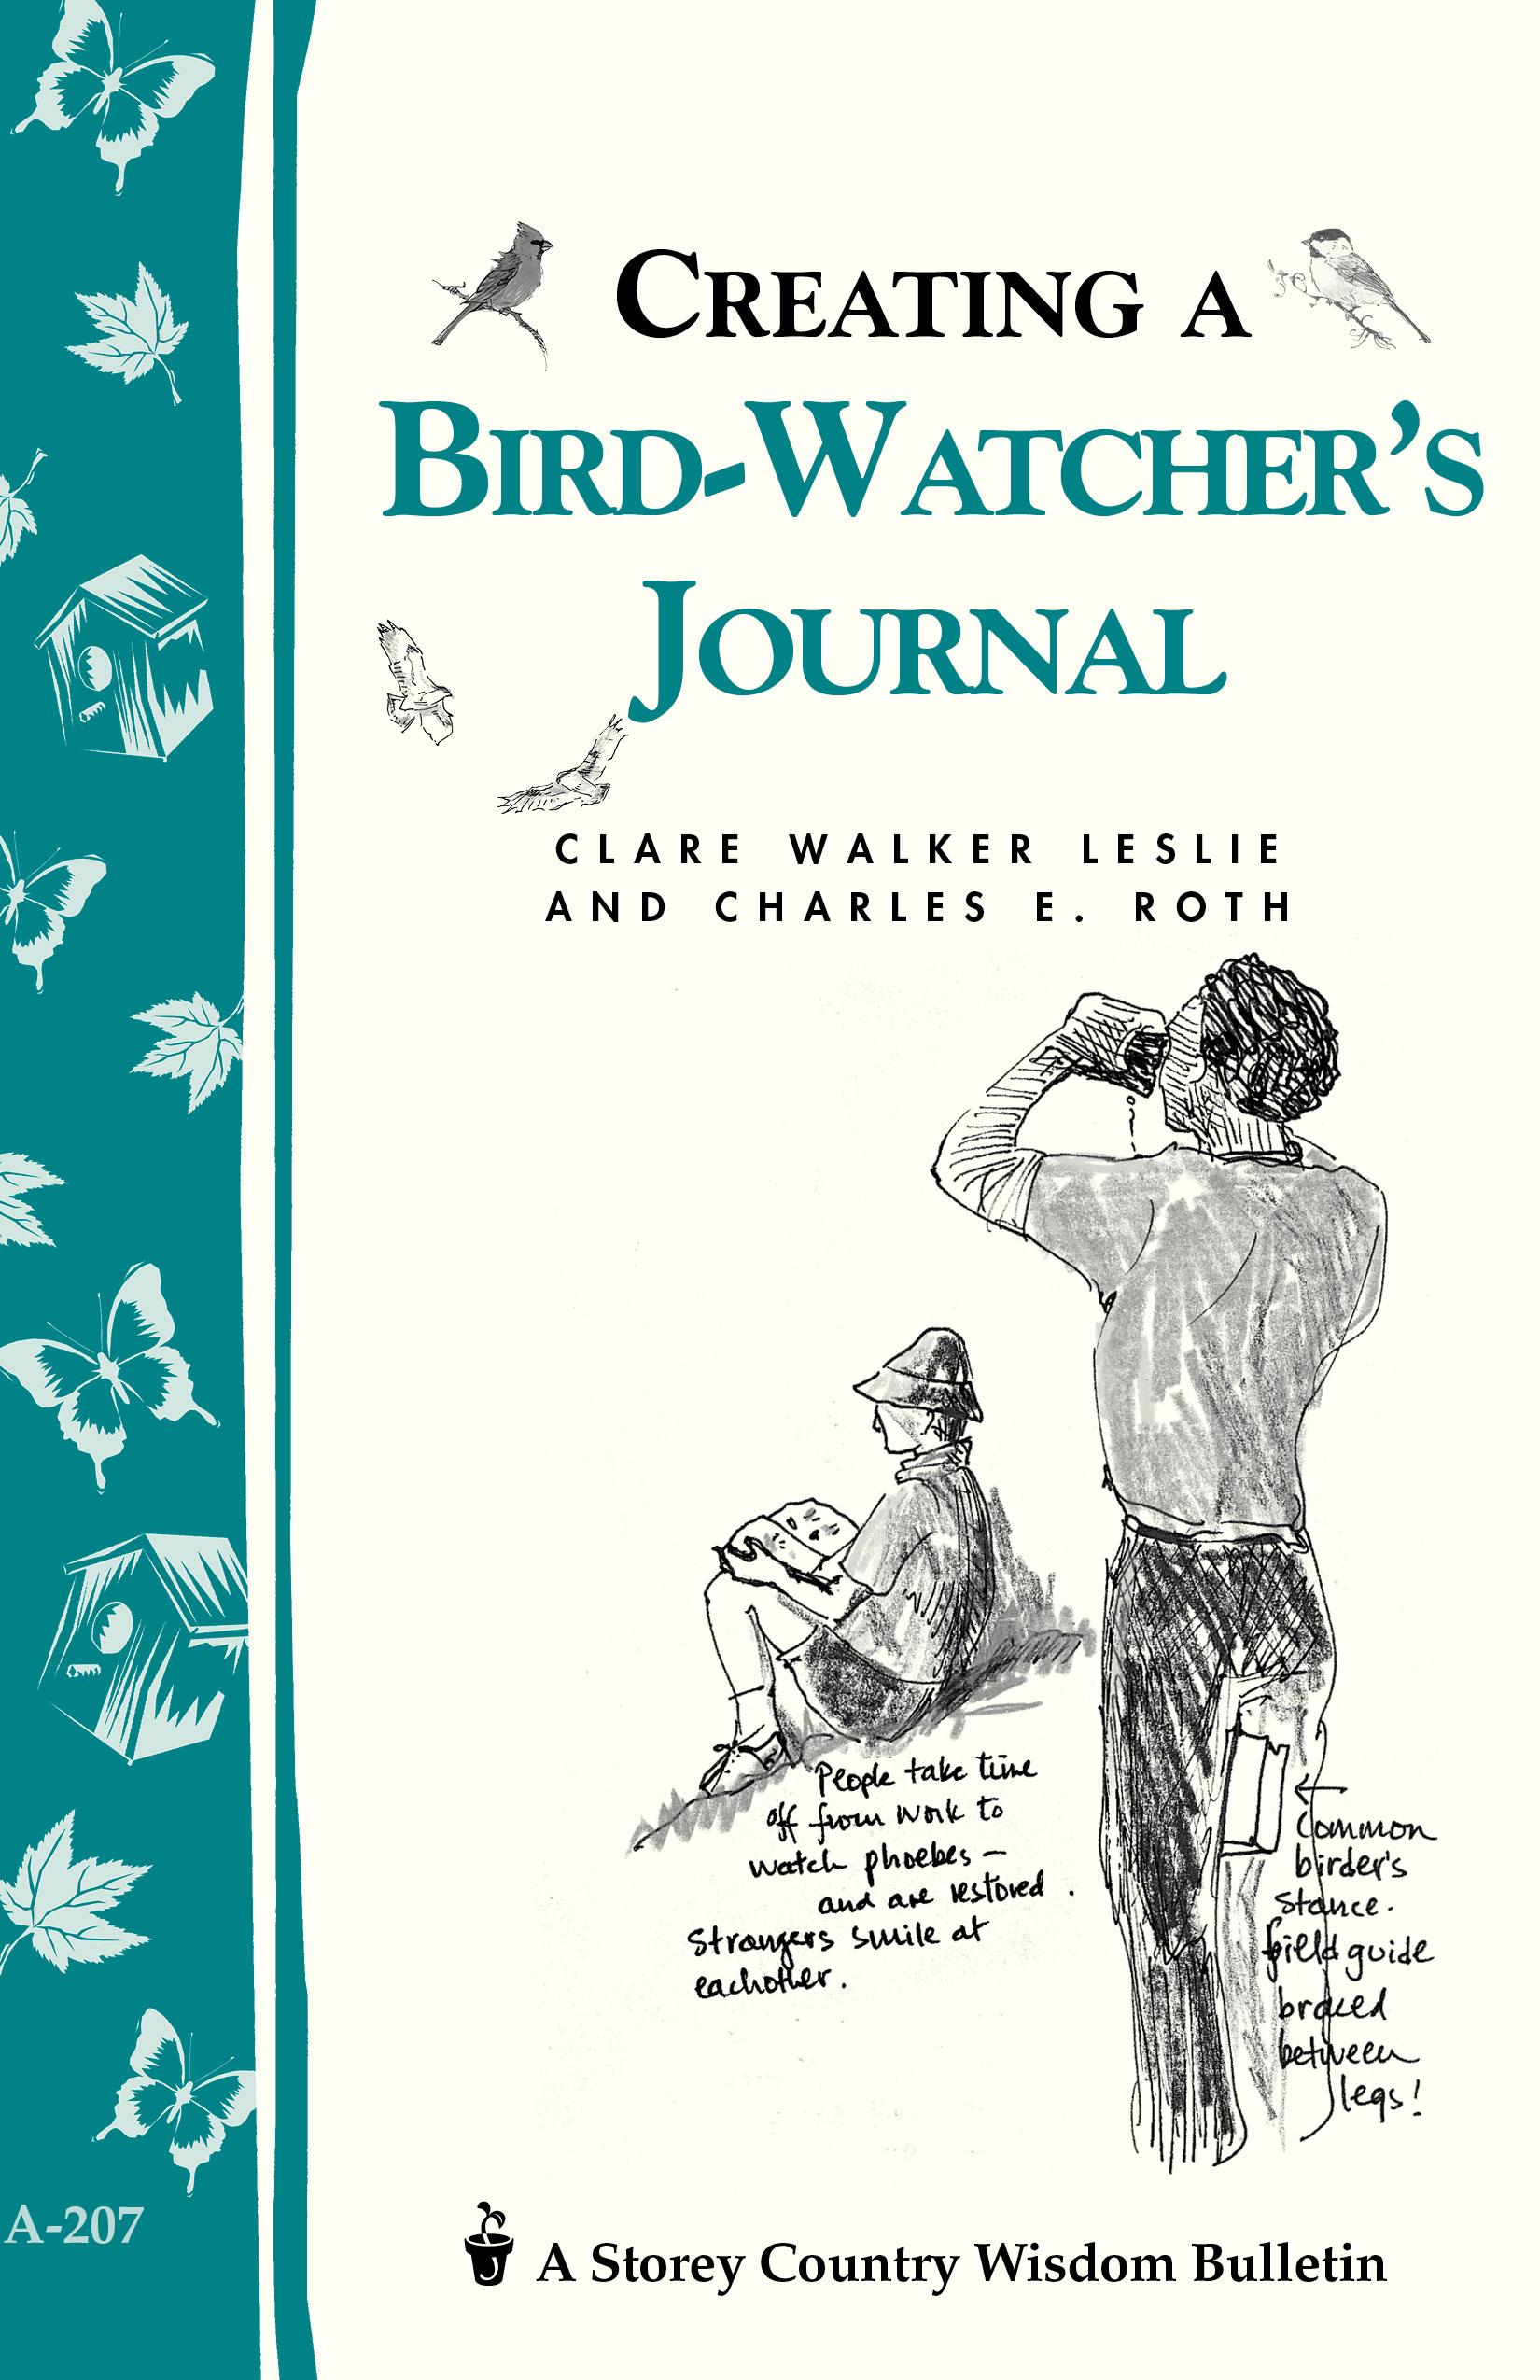 Creating a Bird-Watcher's Journal Storey's Country Wisdom Bulletin A-207 - Clare Walker Leslie